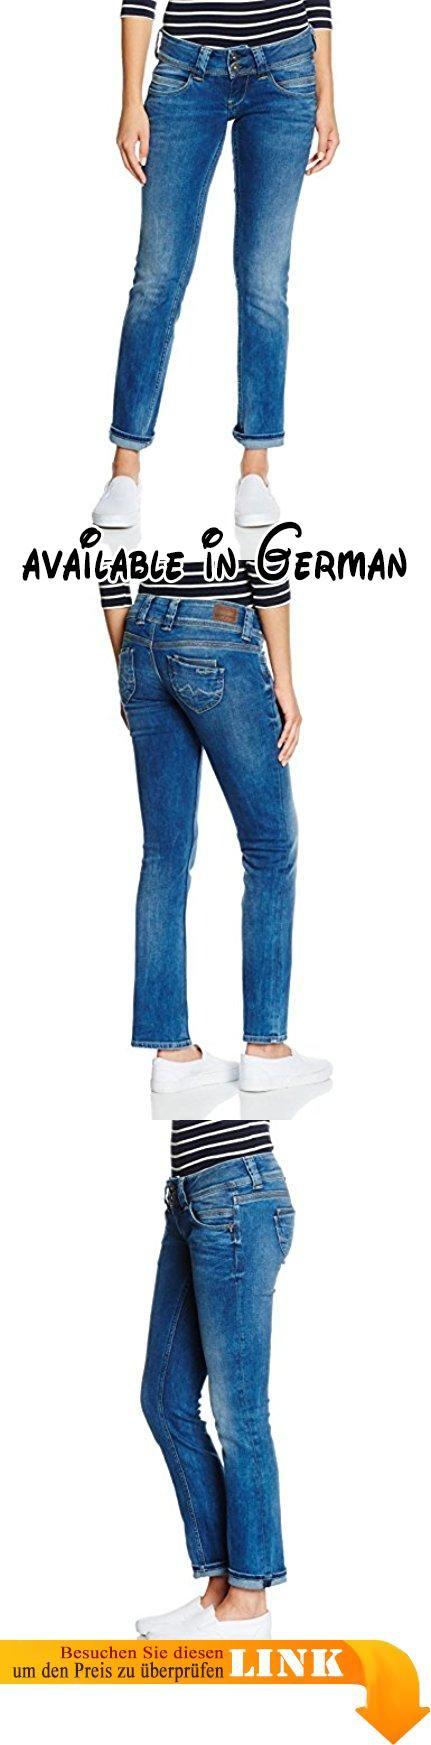 Pepe Jeans Damen Straight Leg Jeans Venus, Blau (PL200029Z552), W32/L32. Straight Fit. niedrige Leibhöhe. gerader Beinverlauf. 11OZ ORIGINAL ROPE DYE MD #Apparel #PANTS